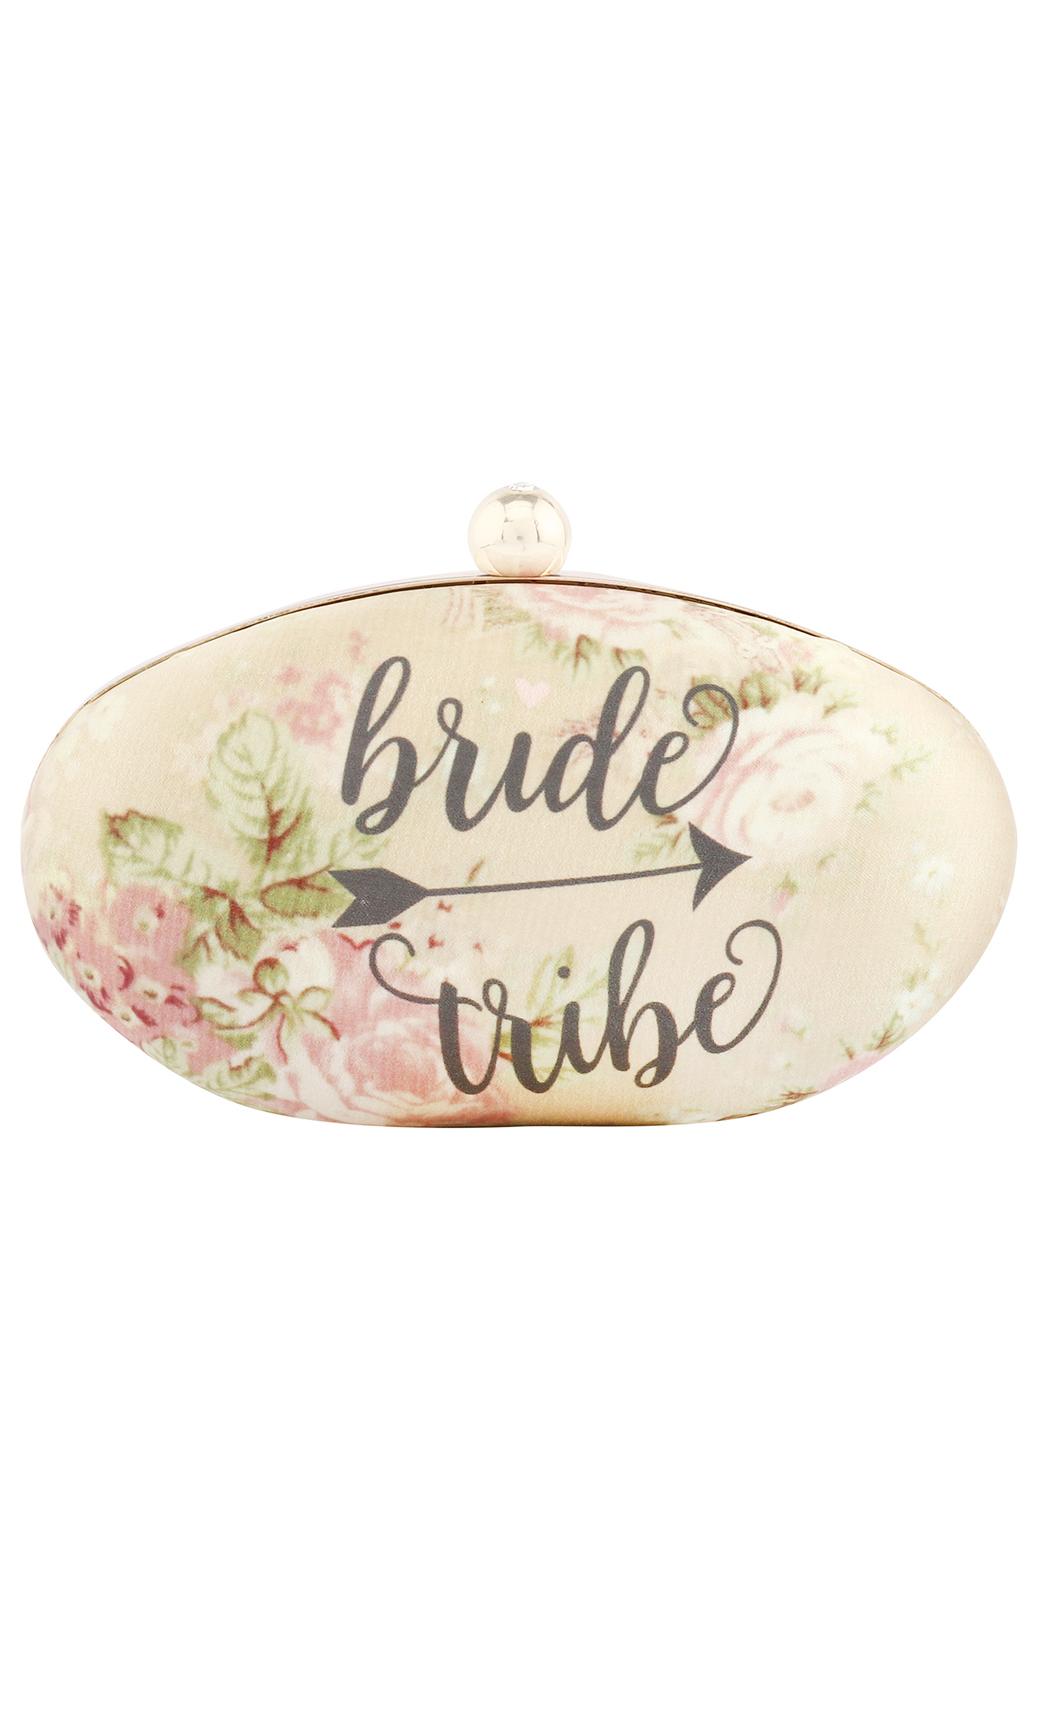 Bride Tribe Clutch